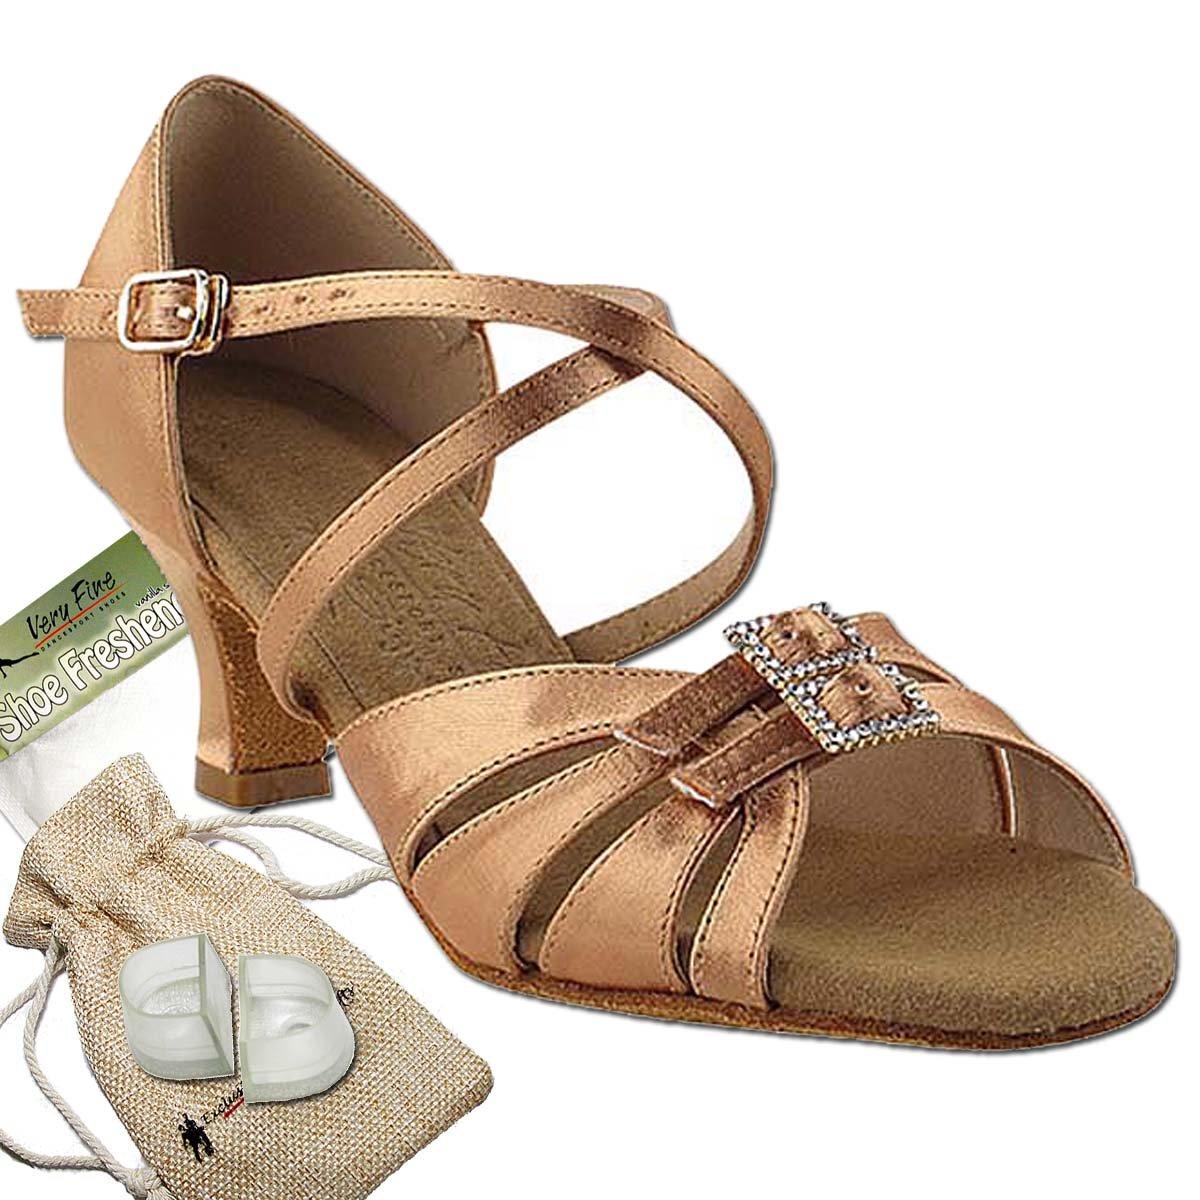 Women's Ballroom Dance Shoes Salsa Latin Practice Dance Shoes Silver Tan Satin S92307EB Comfortable - Very Fine 2'' Heel 7.5 M US [Bundle of 5]